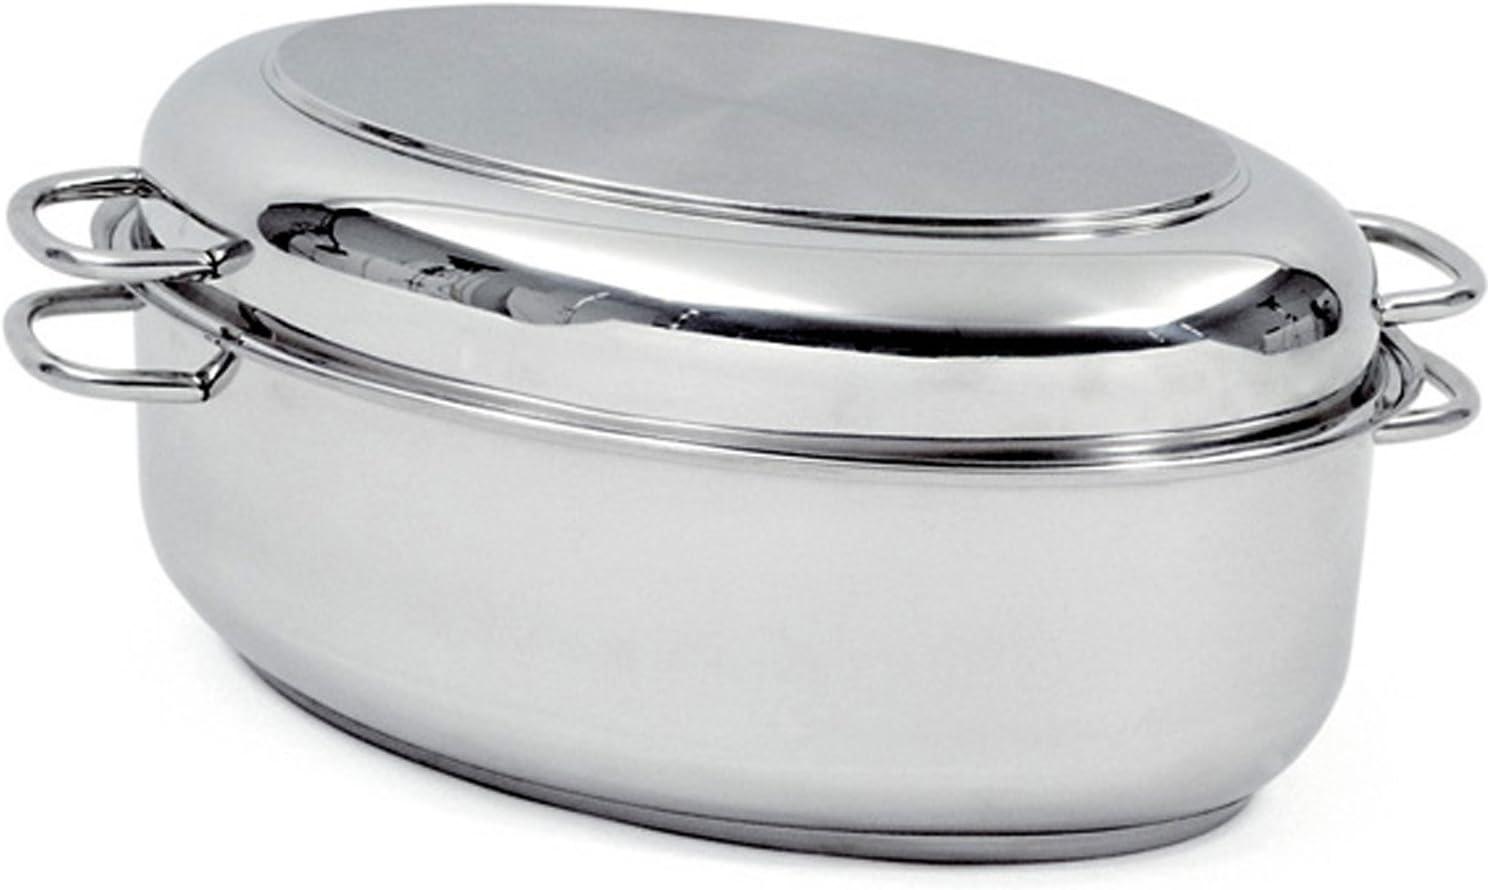 Ranking TOP15 Norpro KRONA Stainless Steel 12-Quart Roaster San Jose Mall Multi Silver